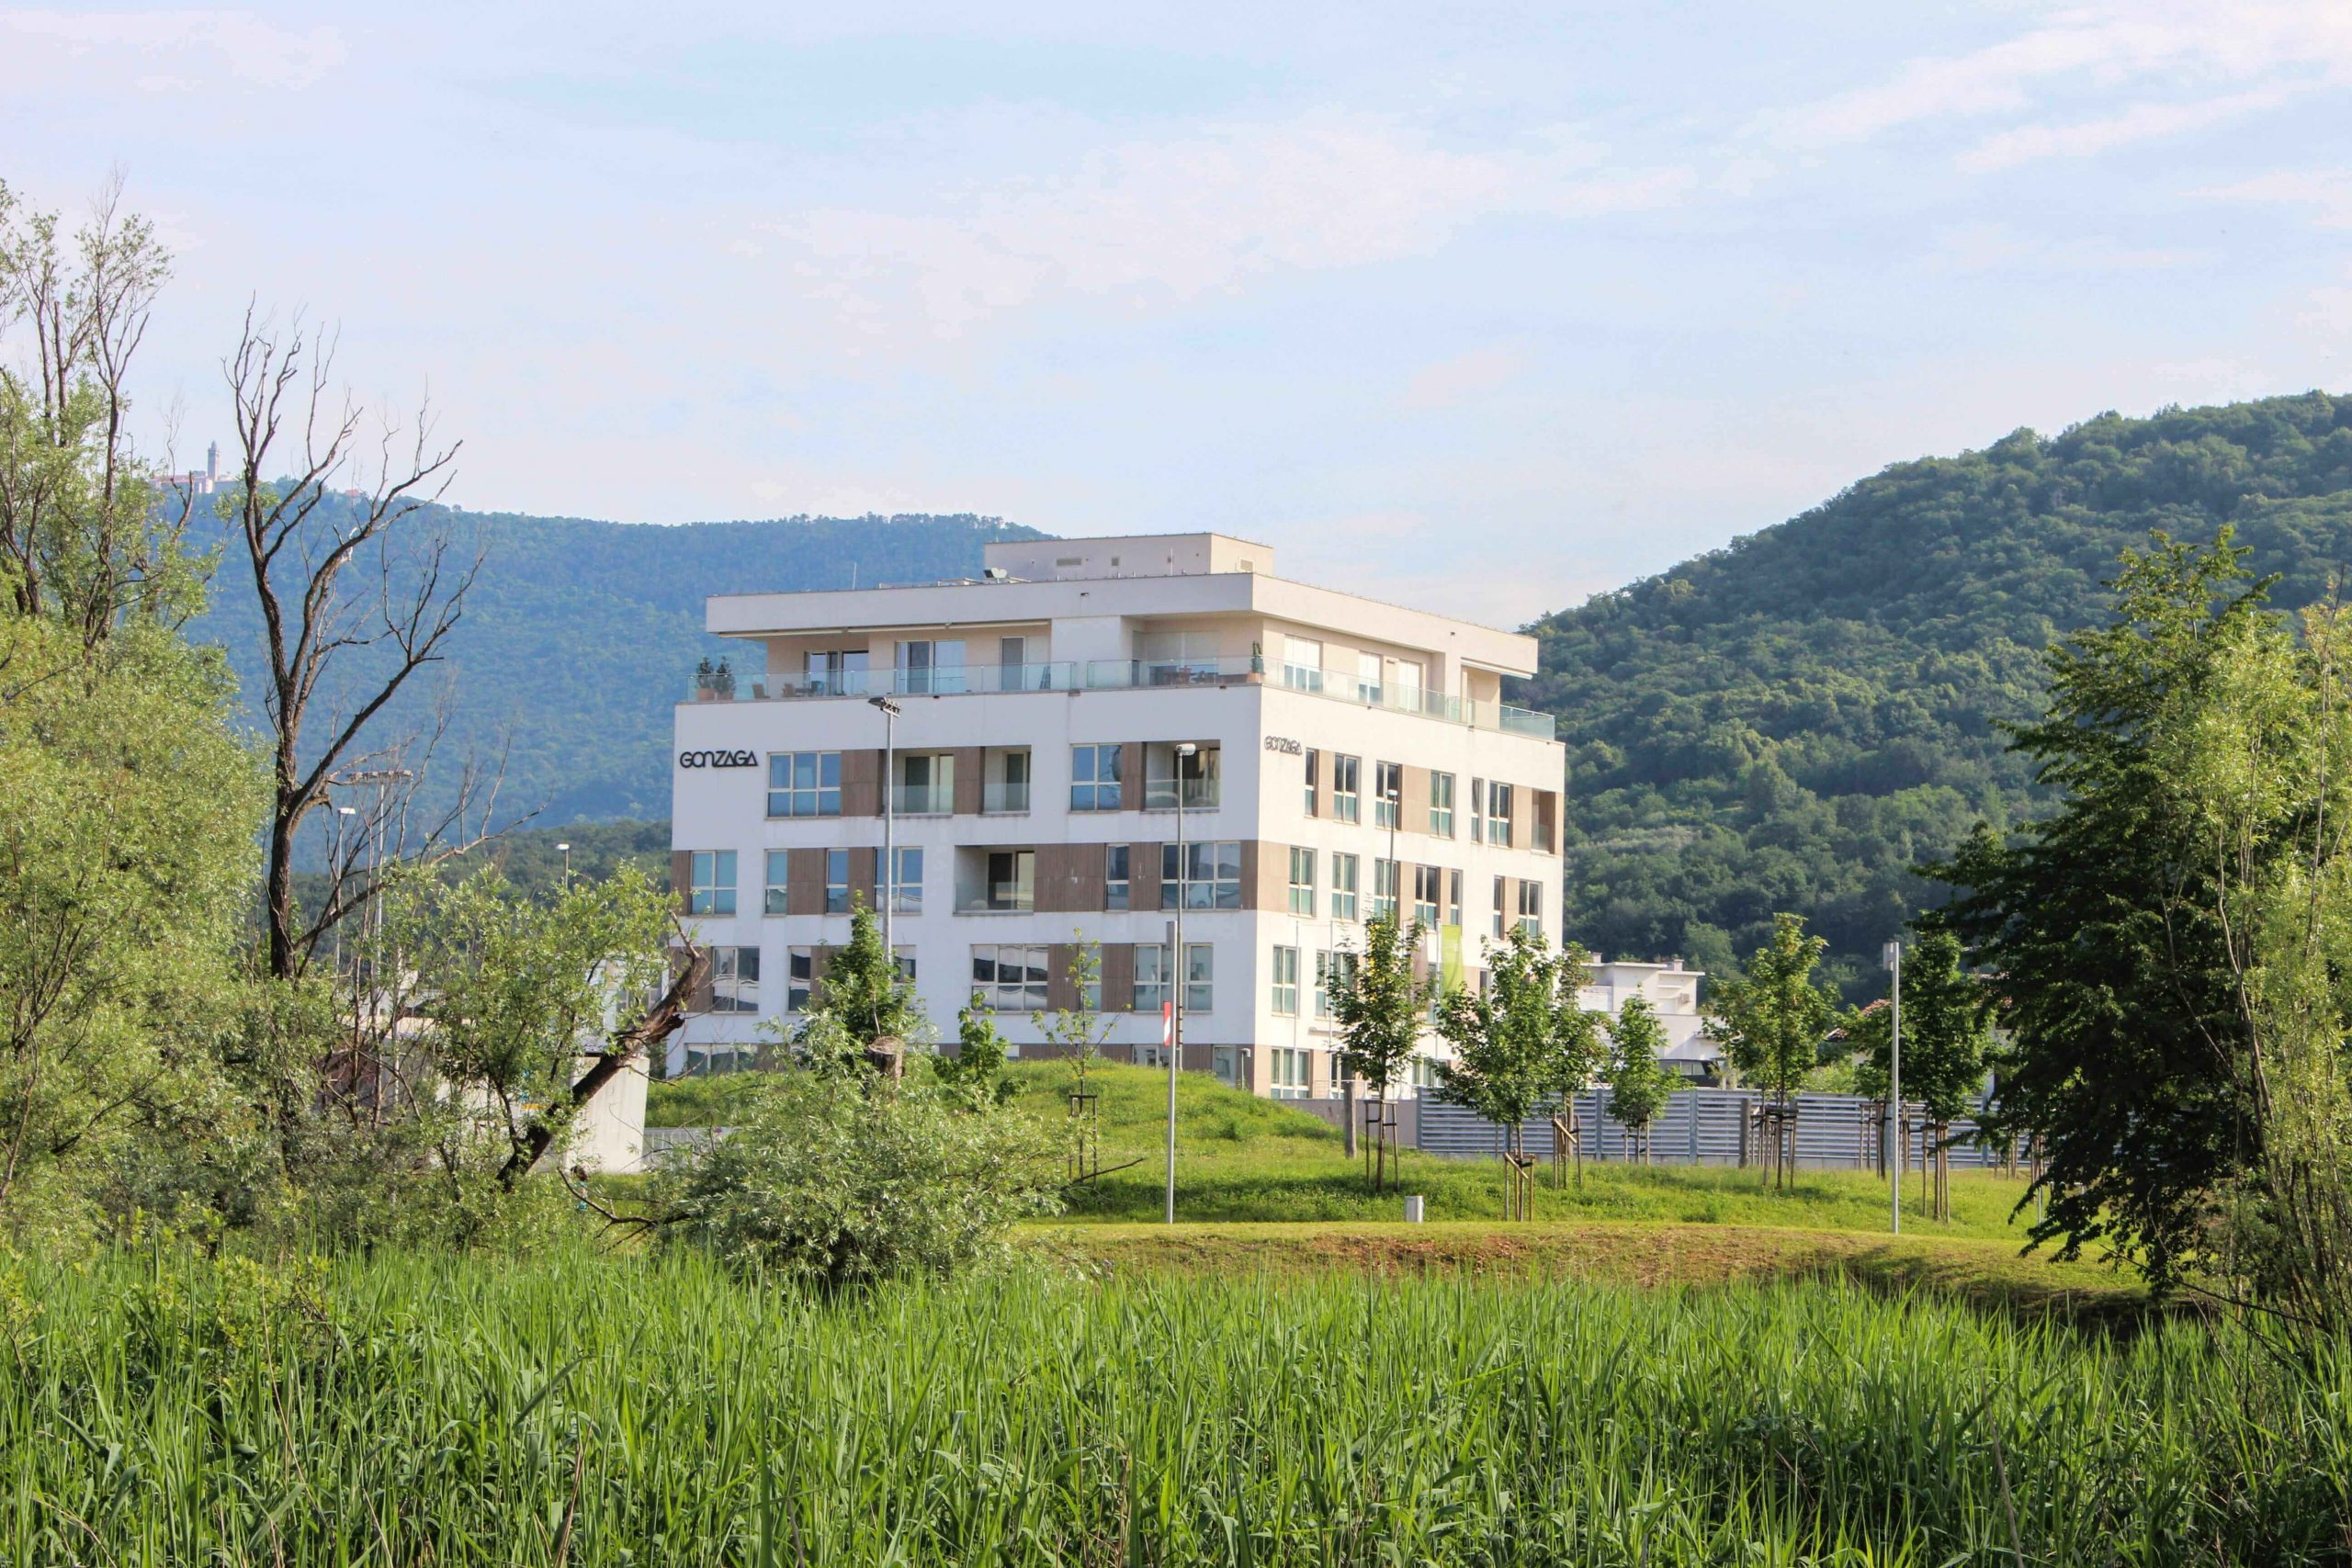 SPIT projektiranje, Poslovno stanovanjska stavba Gonzaga